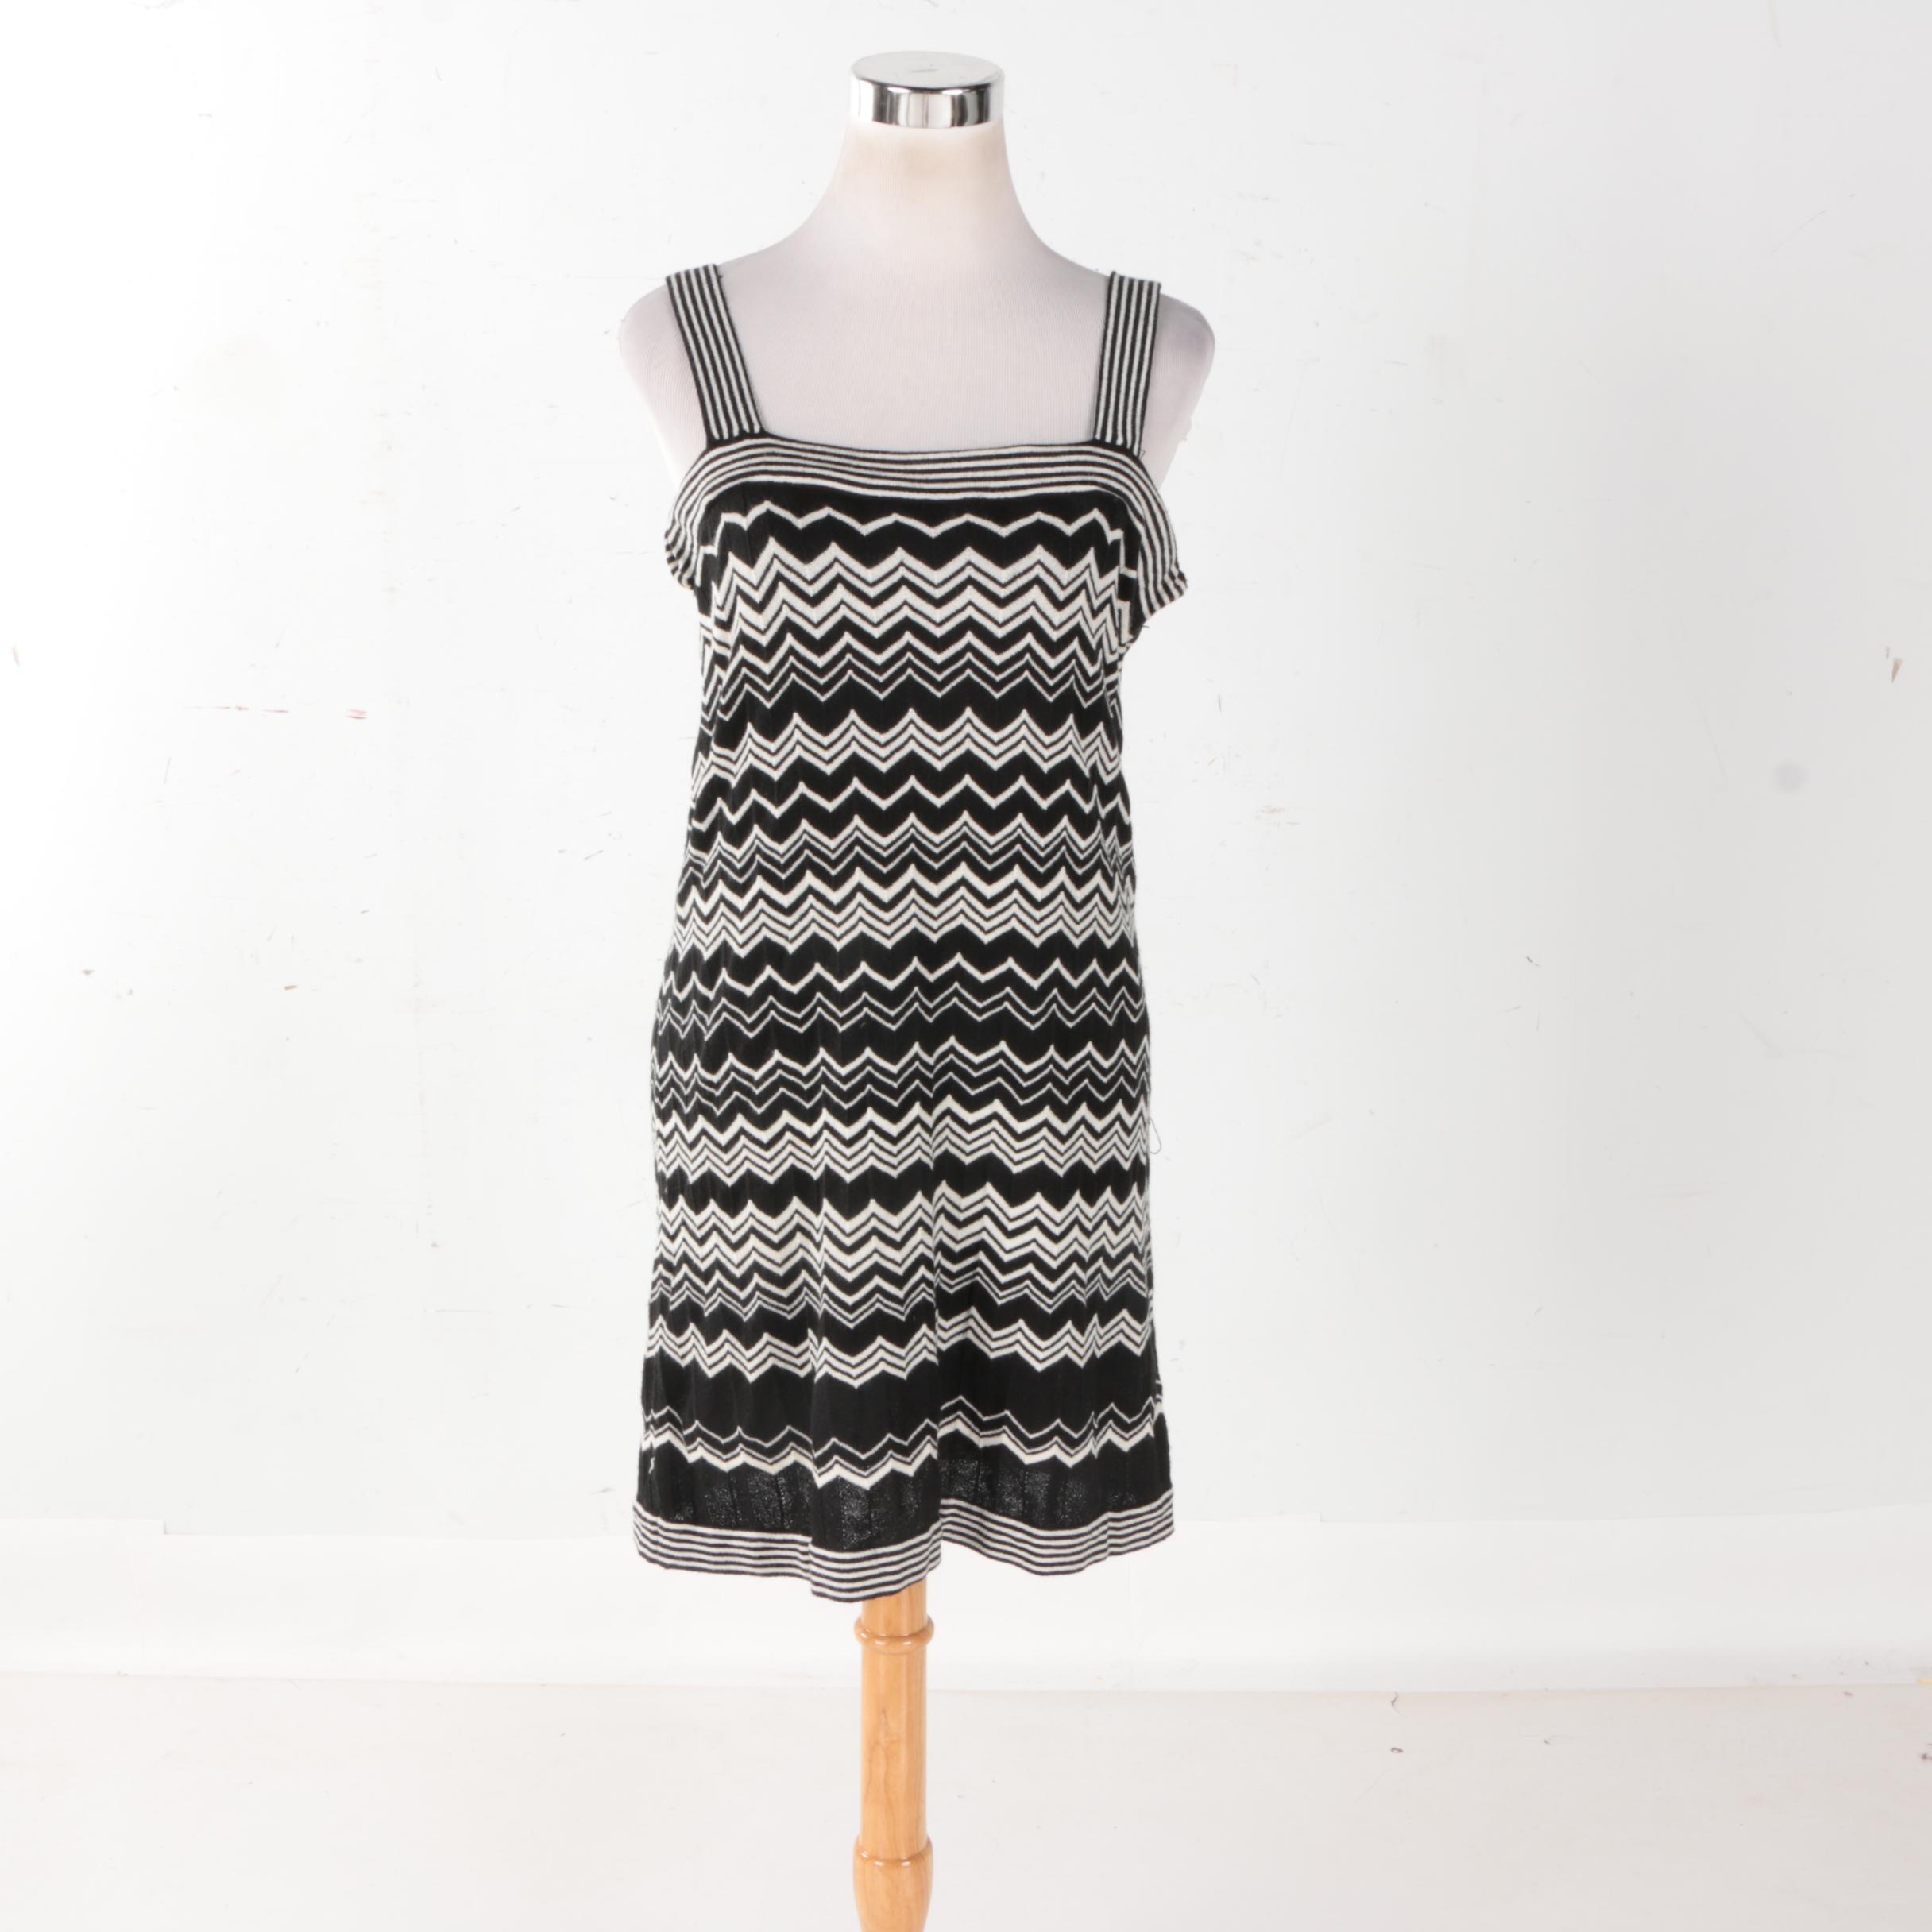 Missoni for Target Black and White Chevron Dress